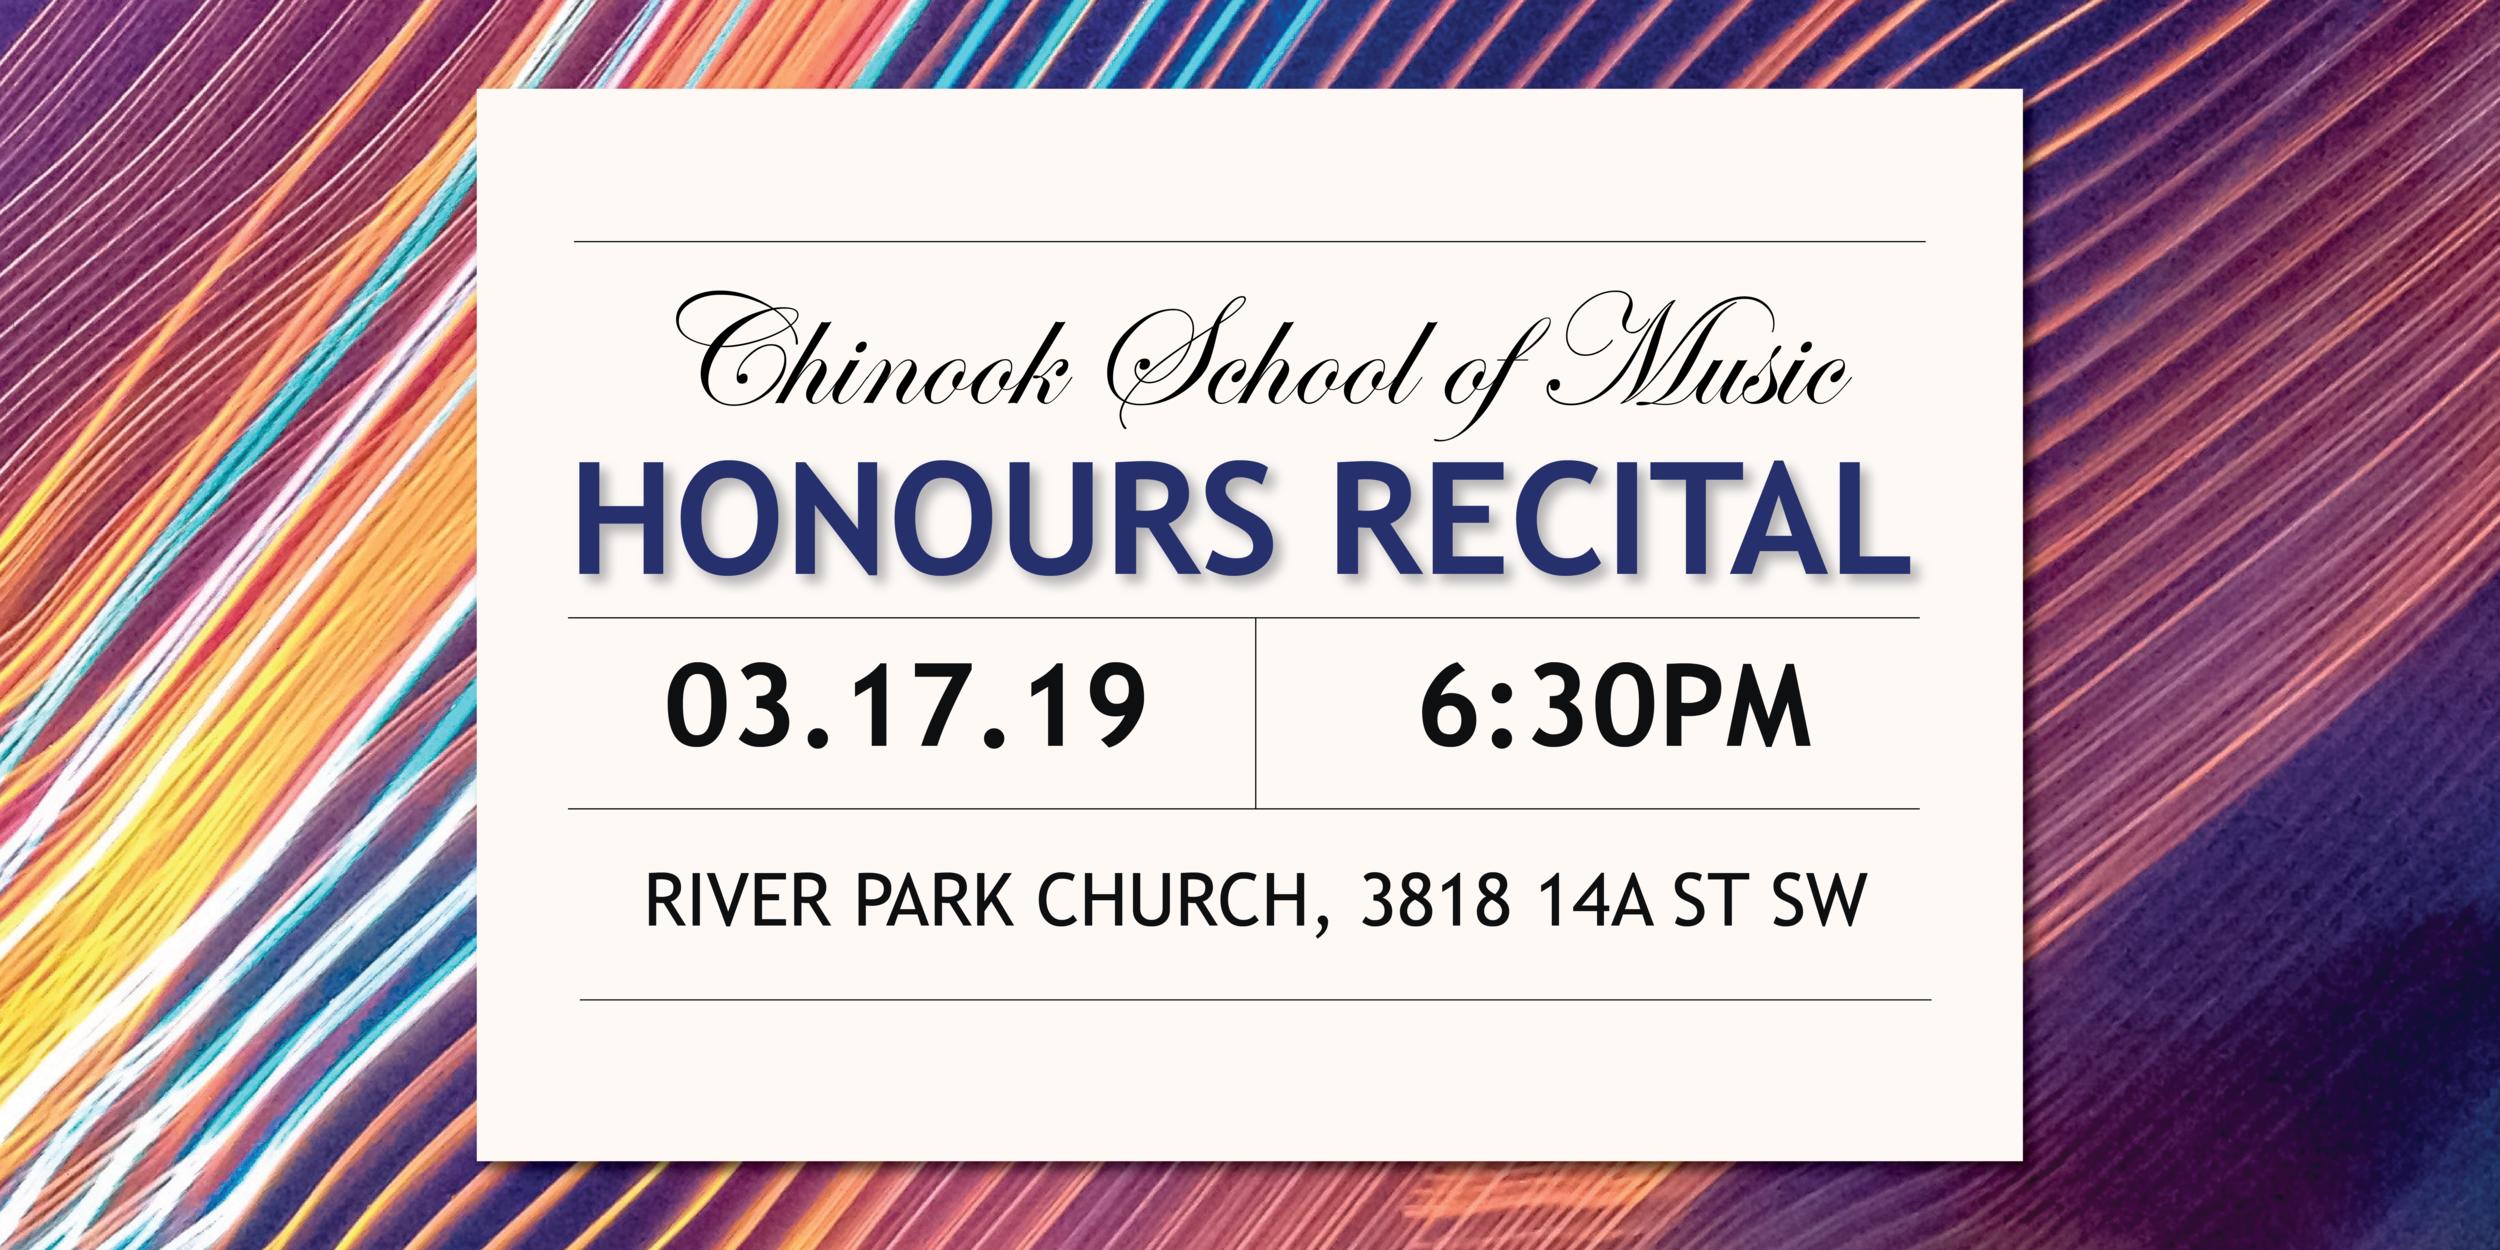 Student Honours Recital